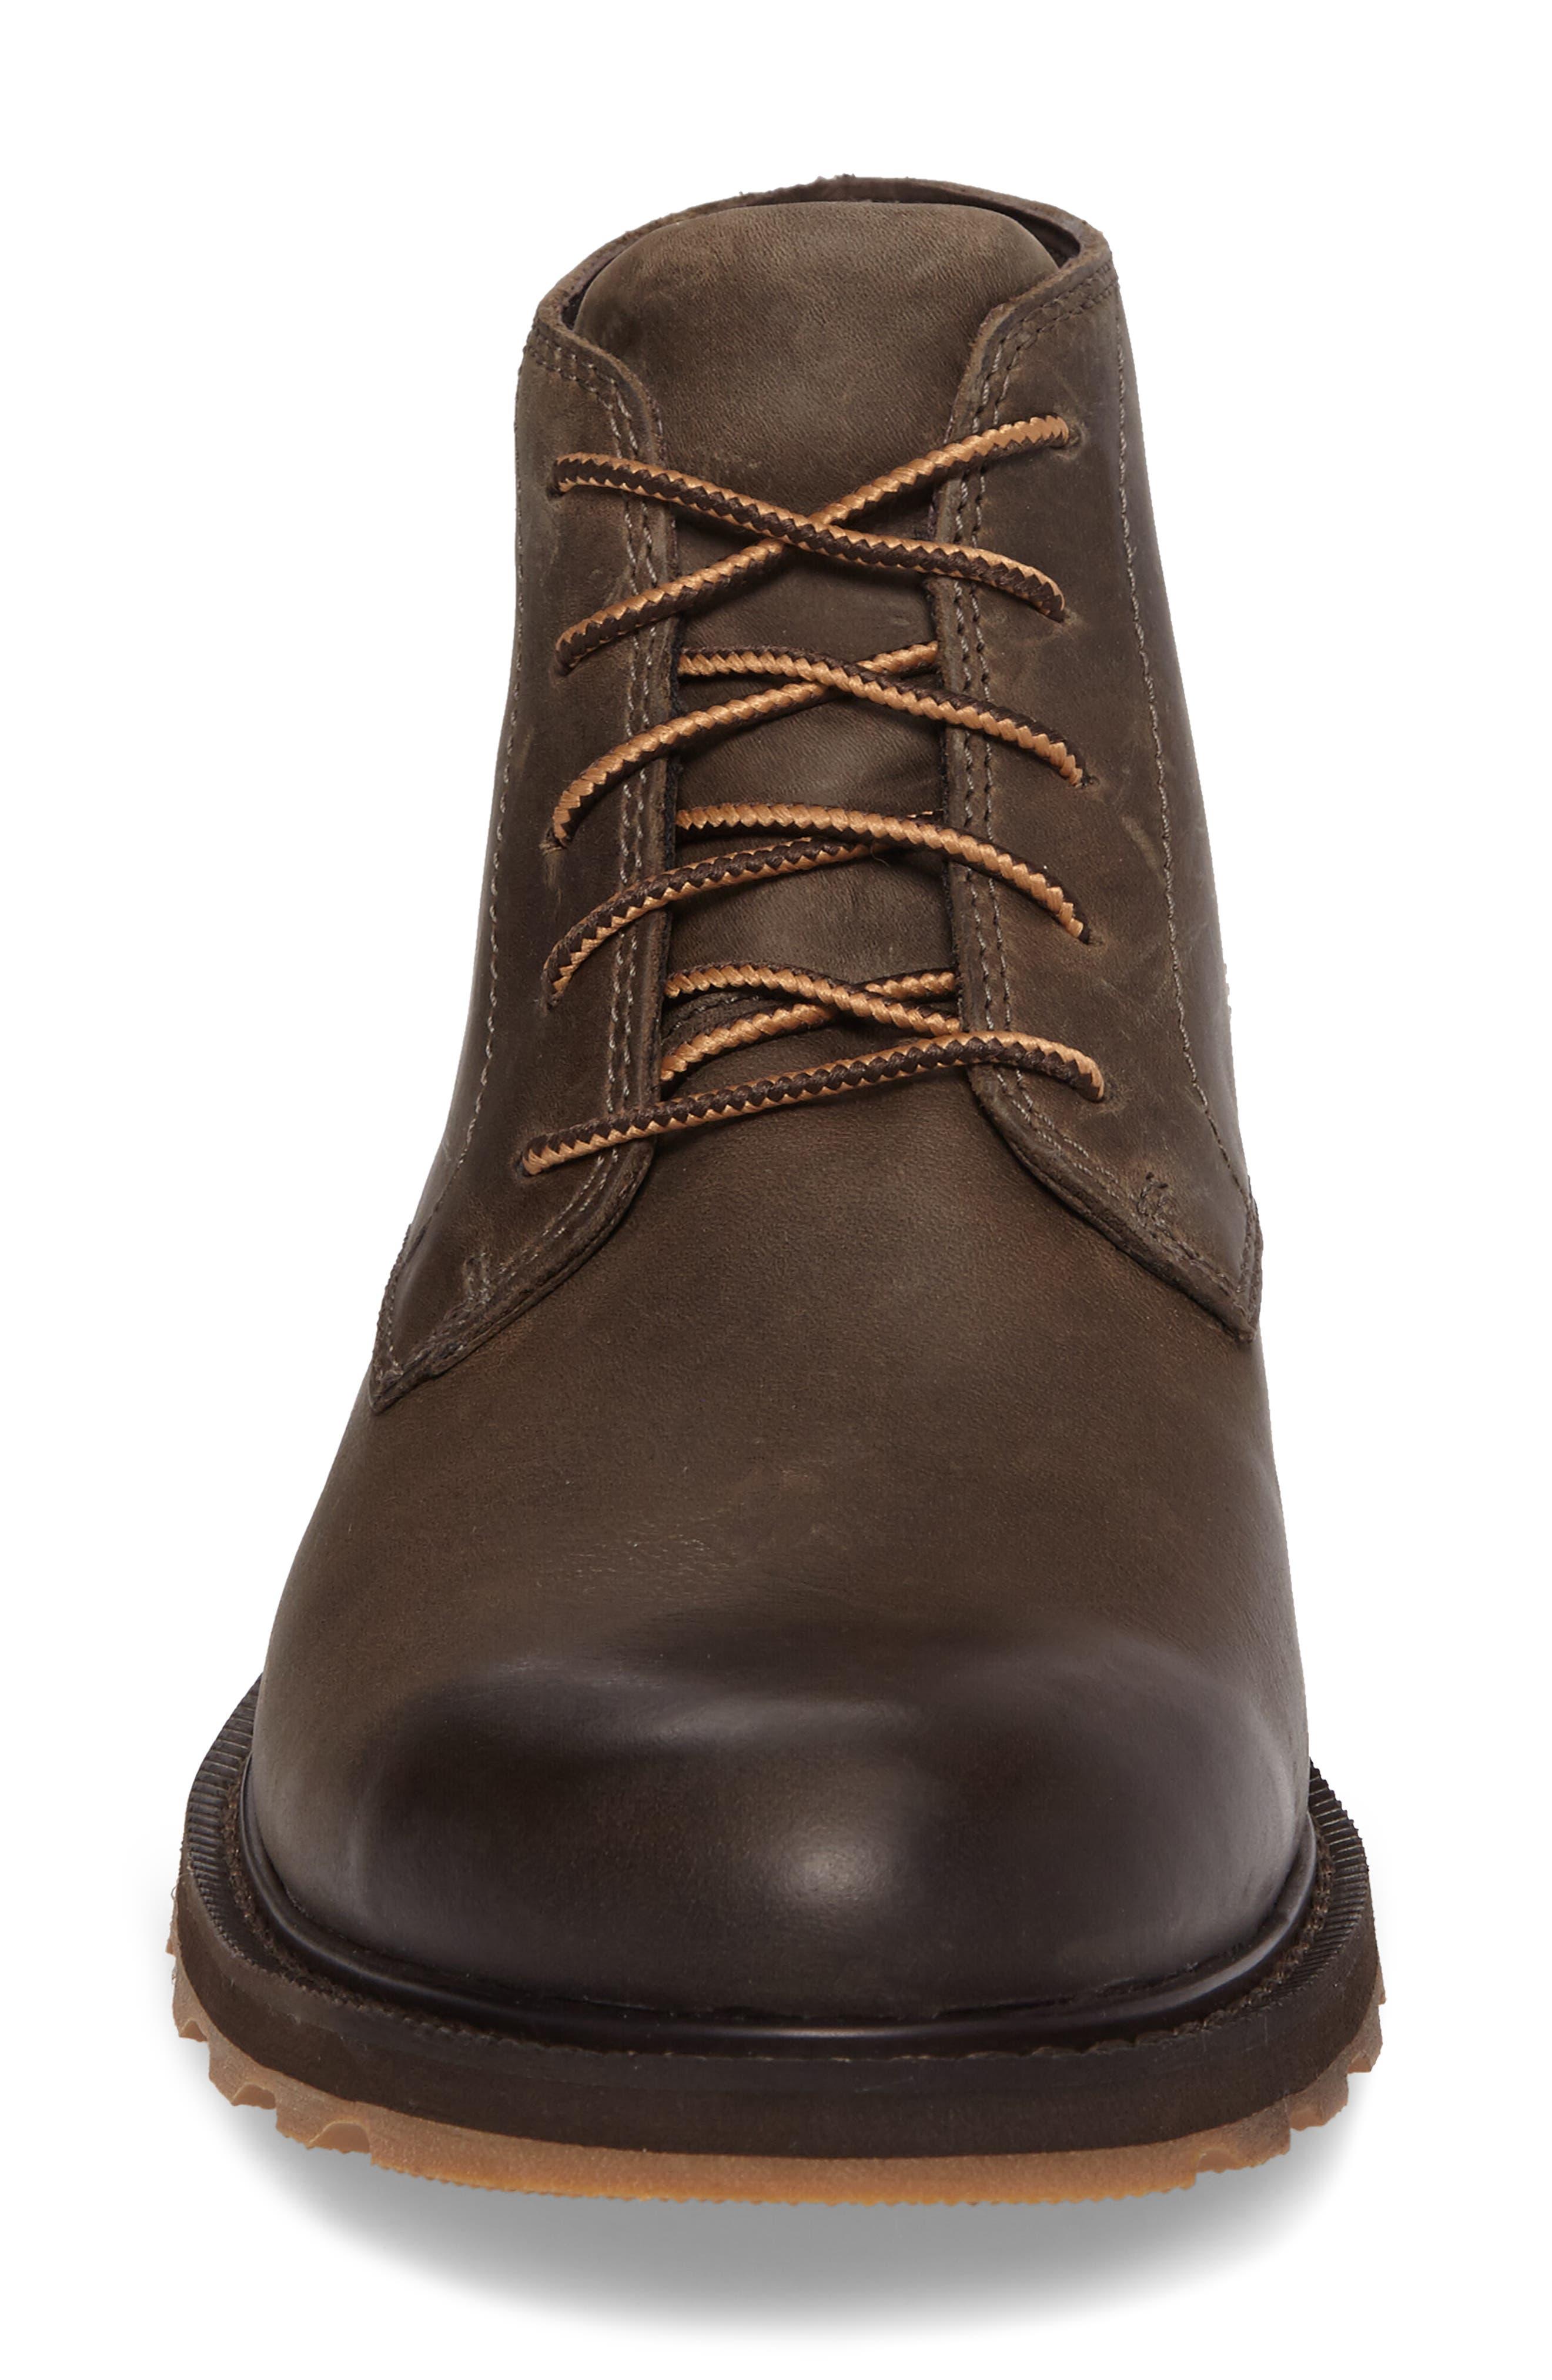 Madson Waterproof Boot,                             Alternate thumbnail 4, color,                             Major/ Cordovan